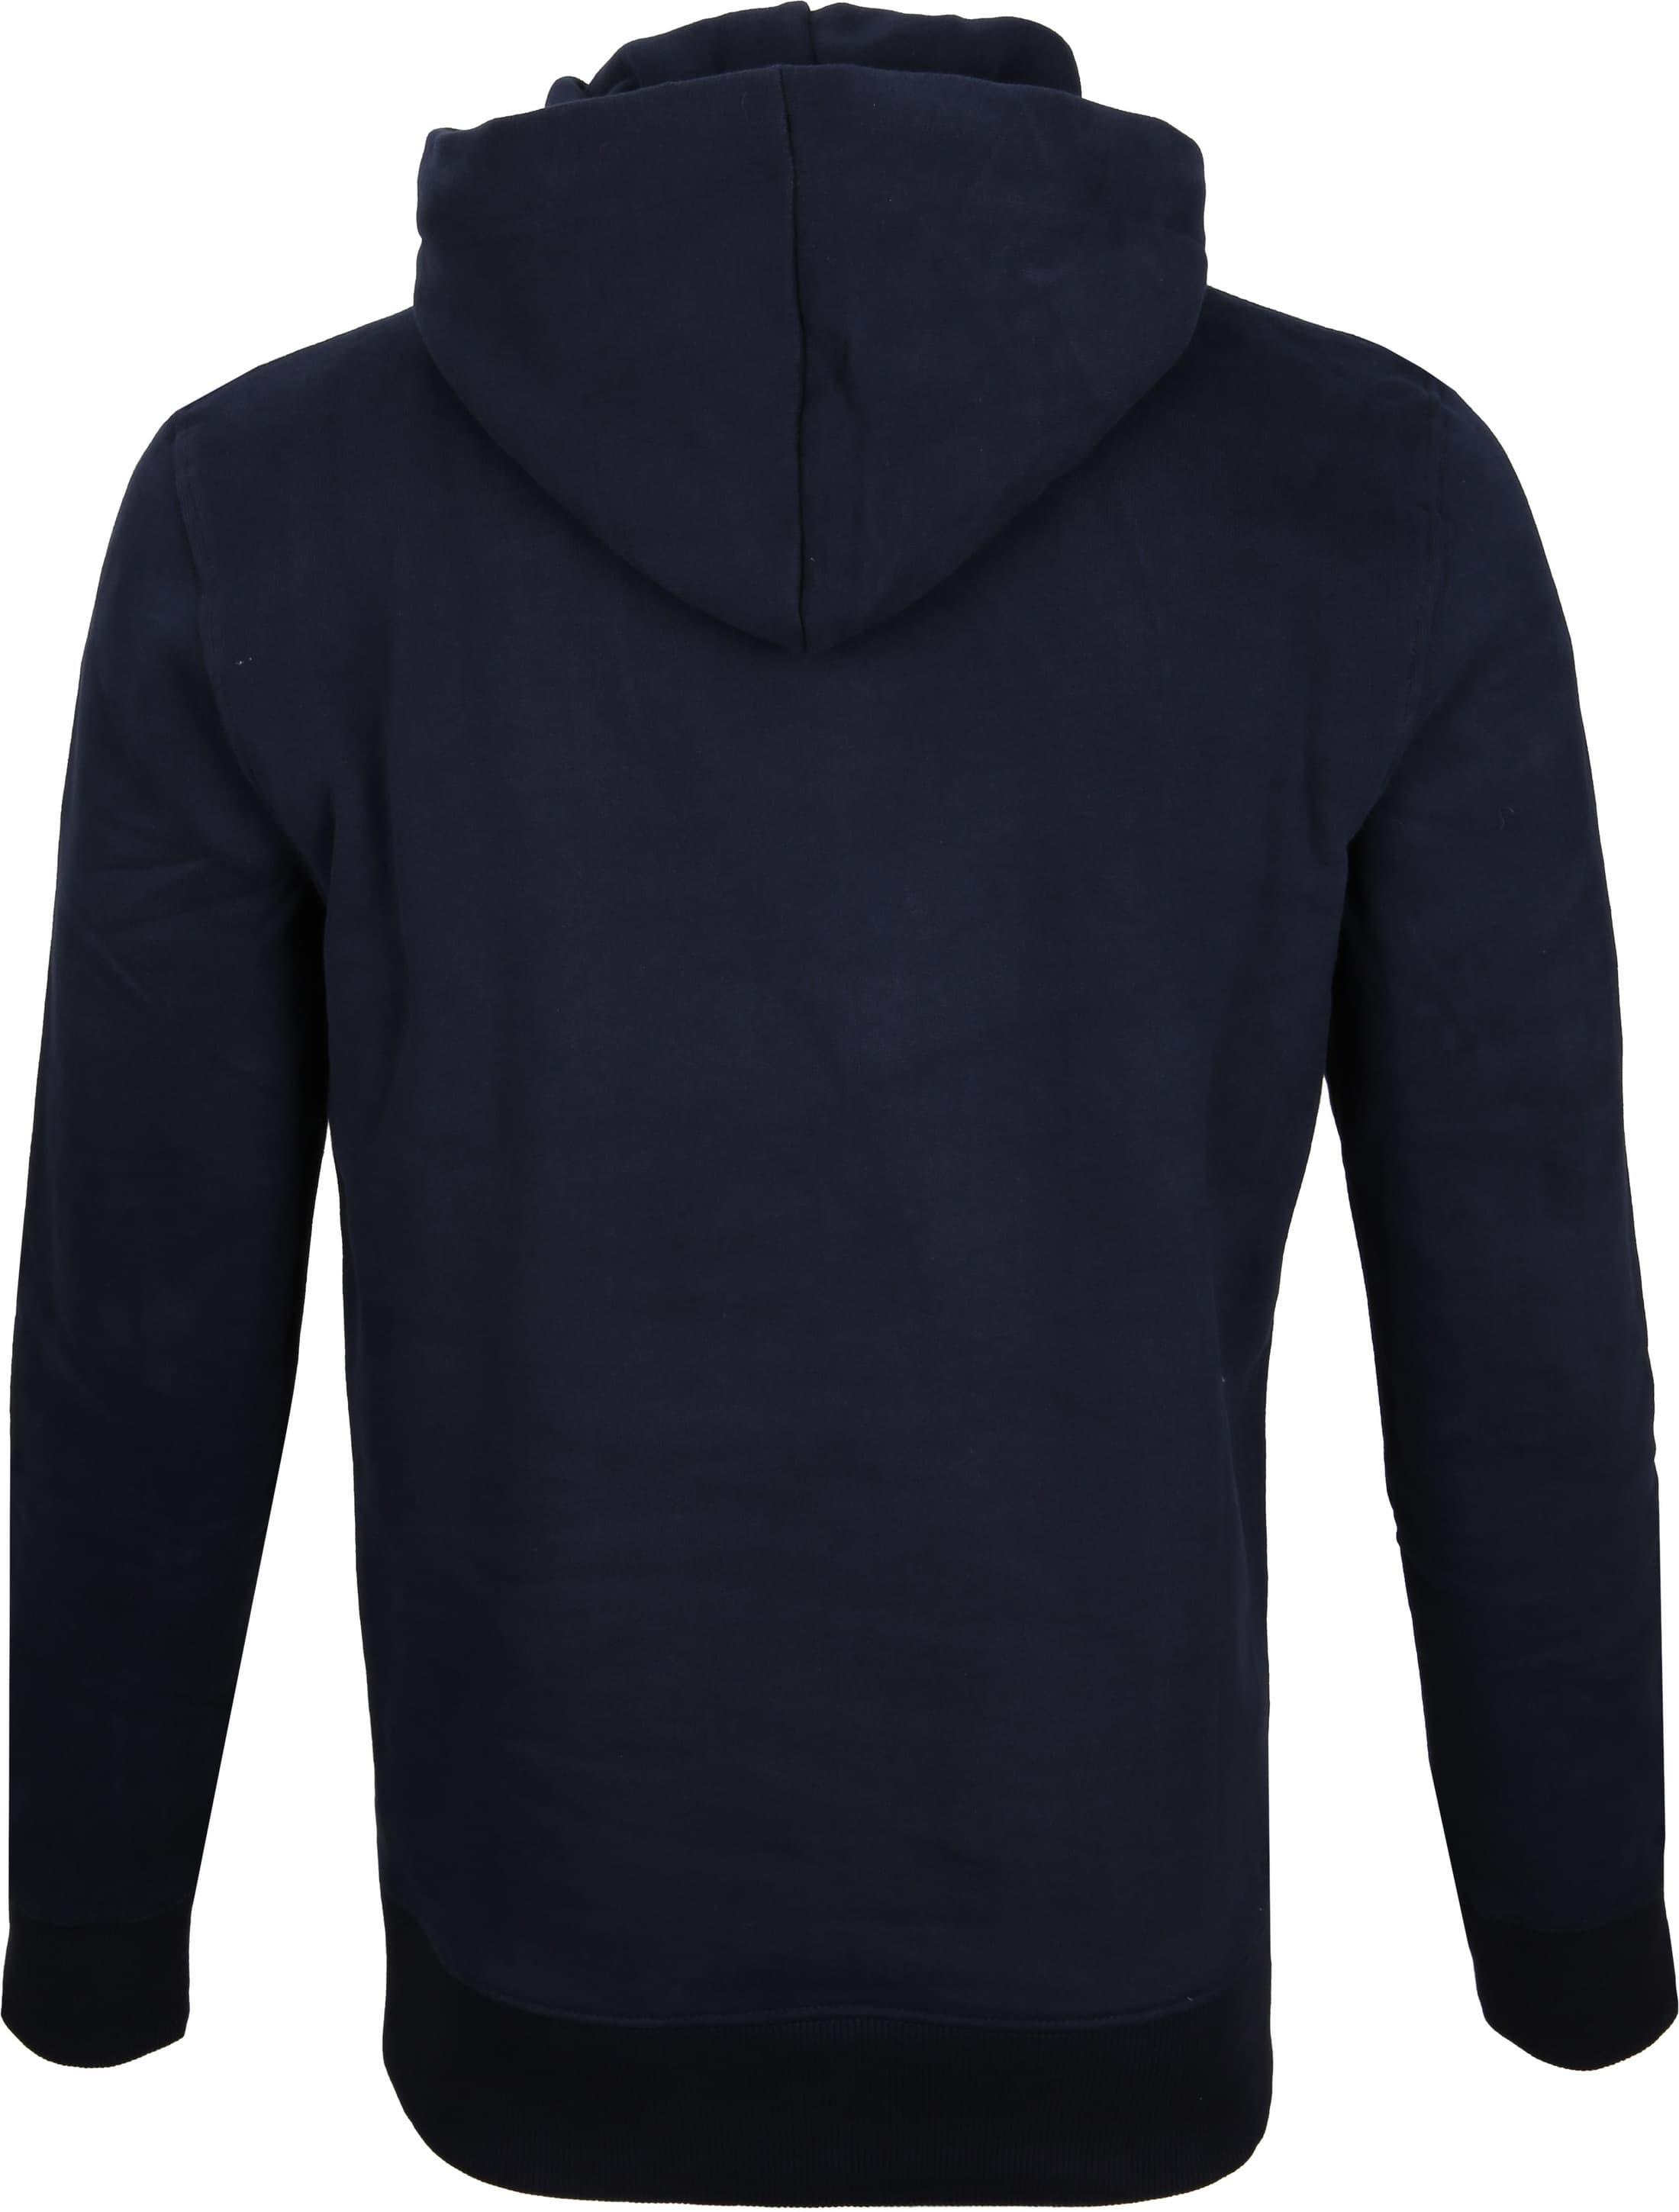 Superdry Sweater Logo Donkerblauw foto 5